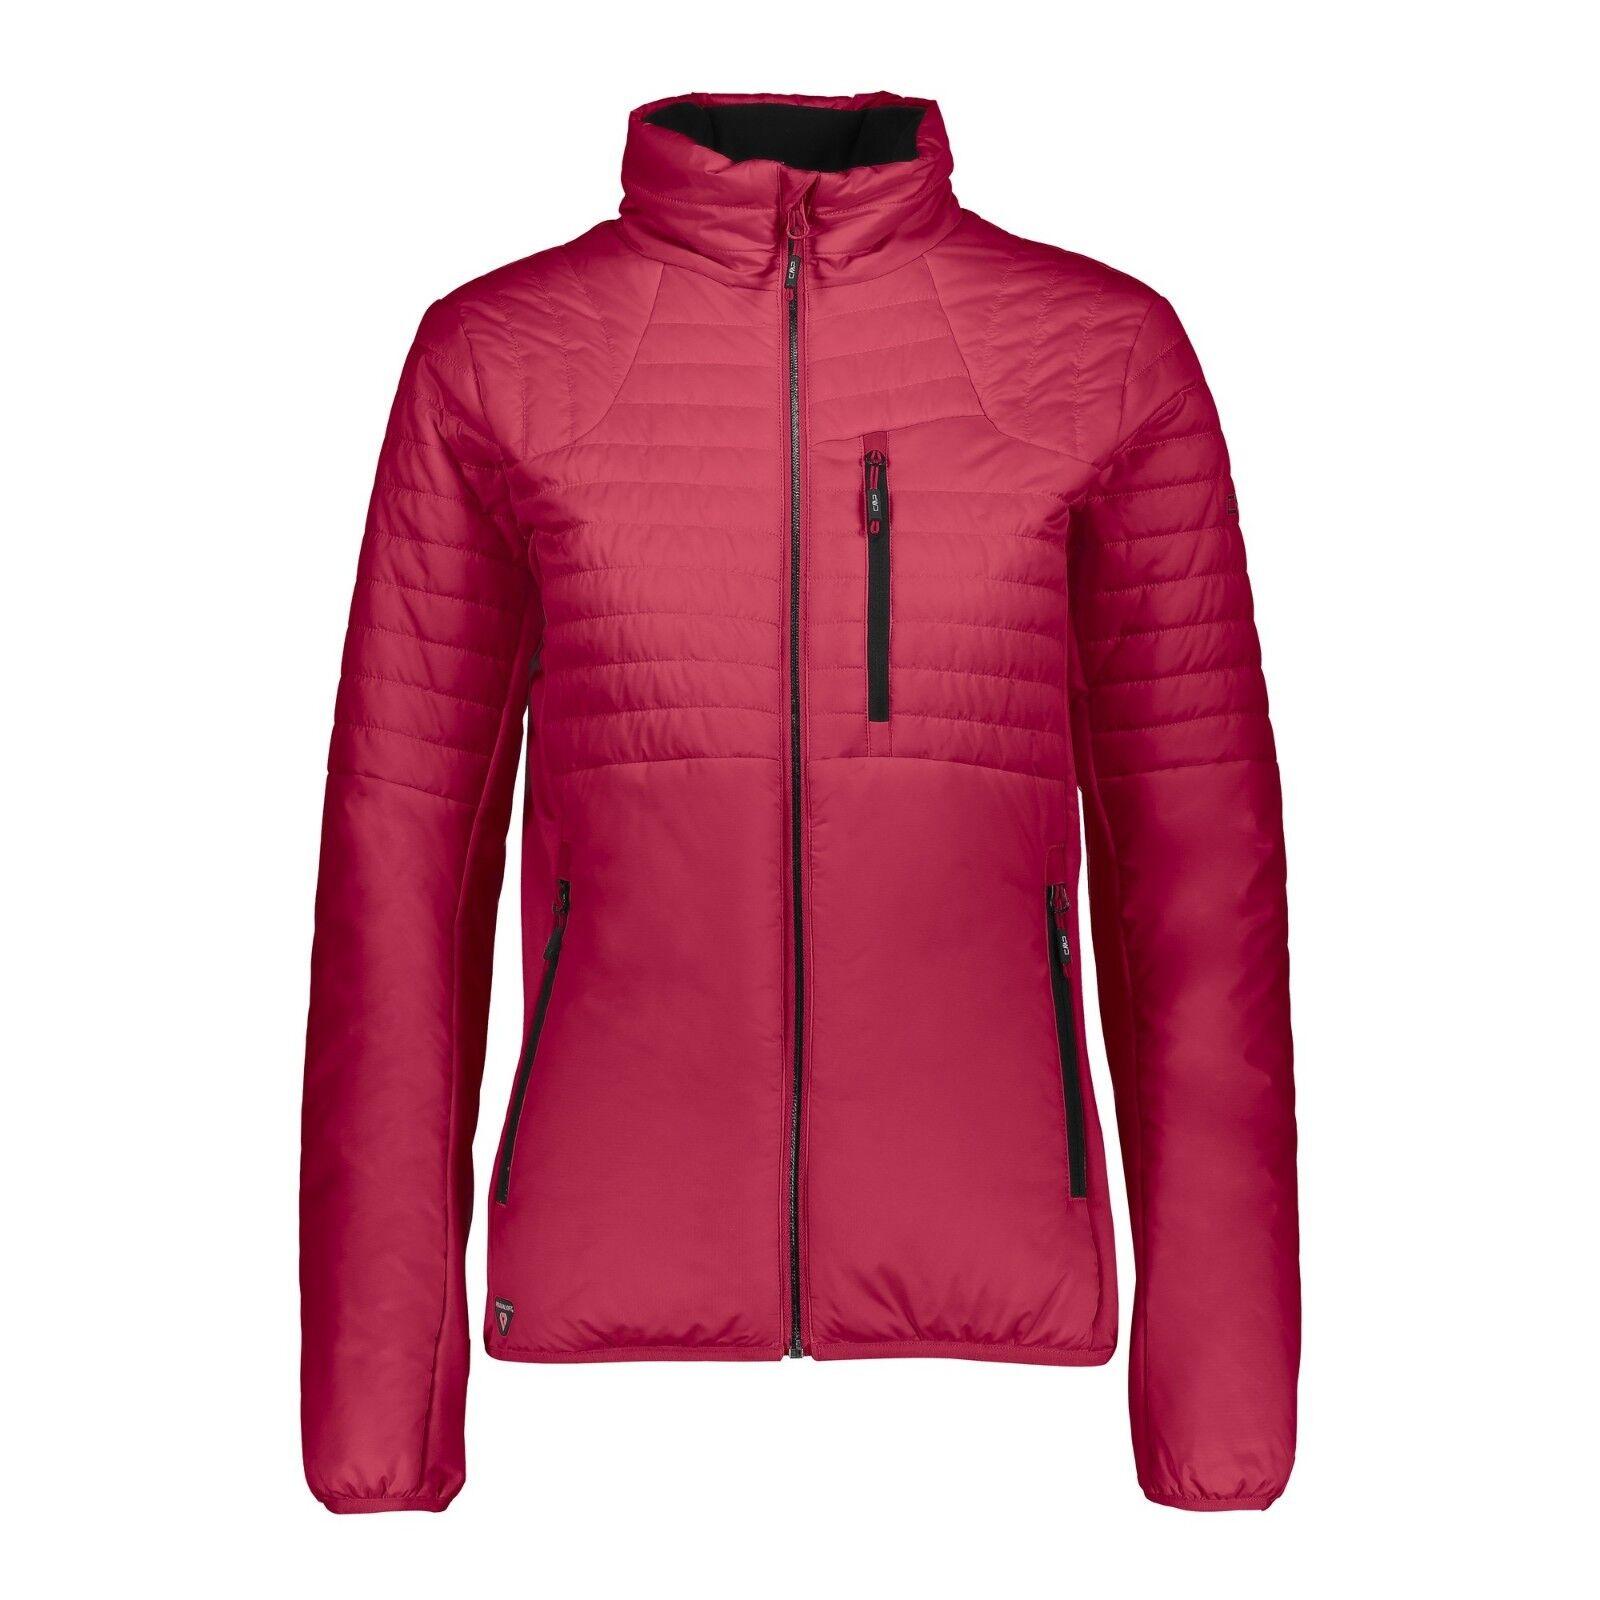 CMP Jacke 38Z0916 damen Jacket Damen Steppjacke Primaloft corallo Langlauf 36-48